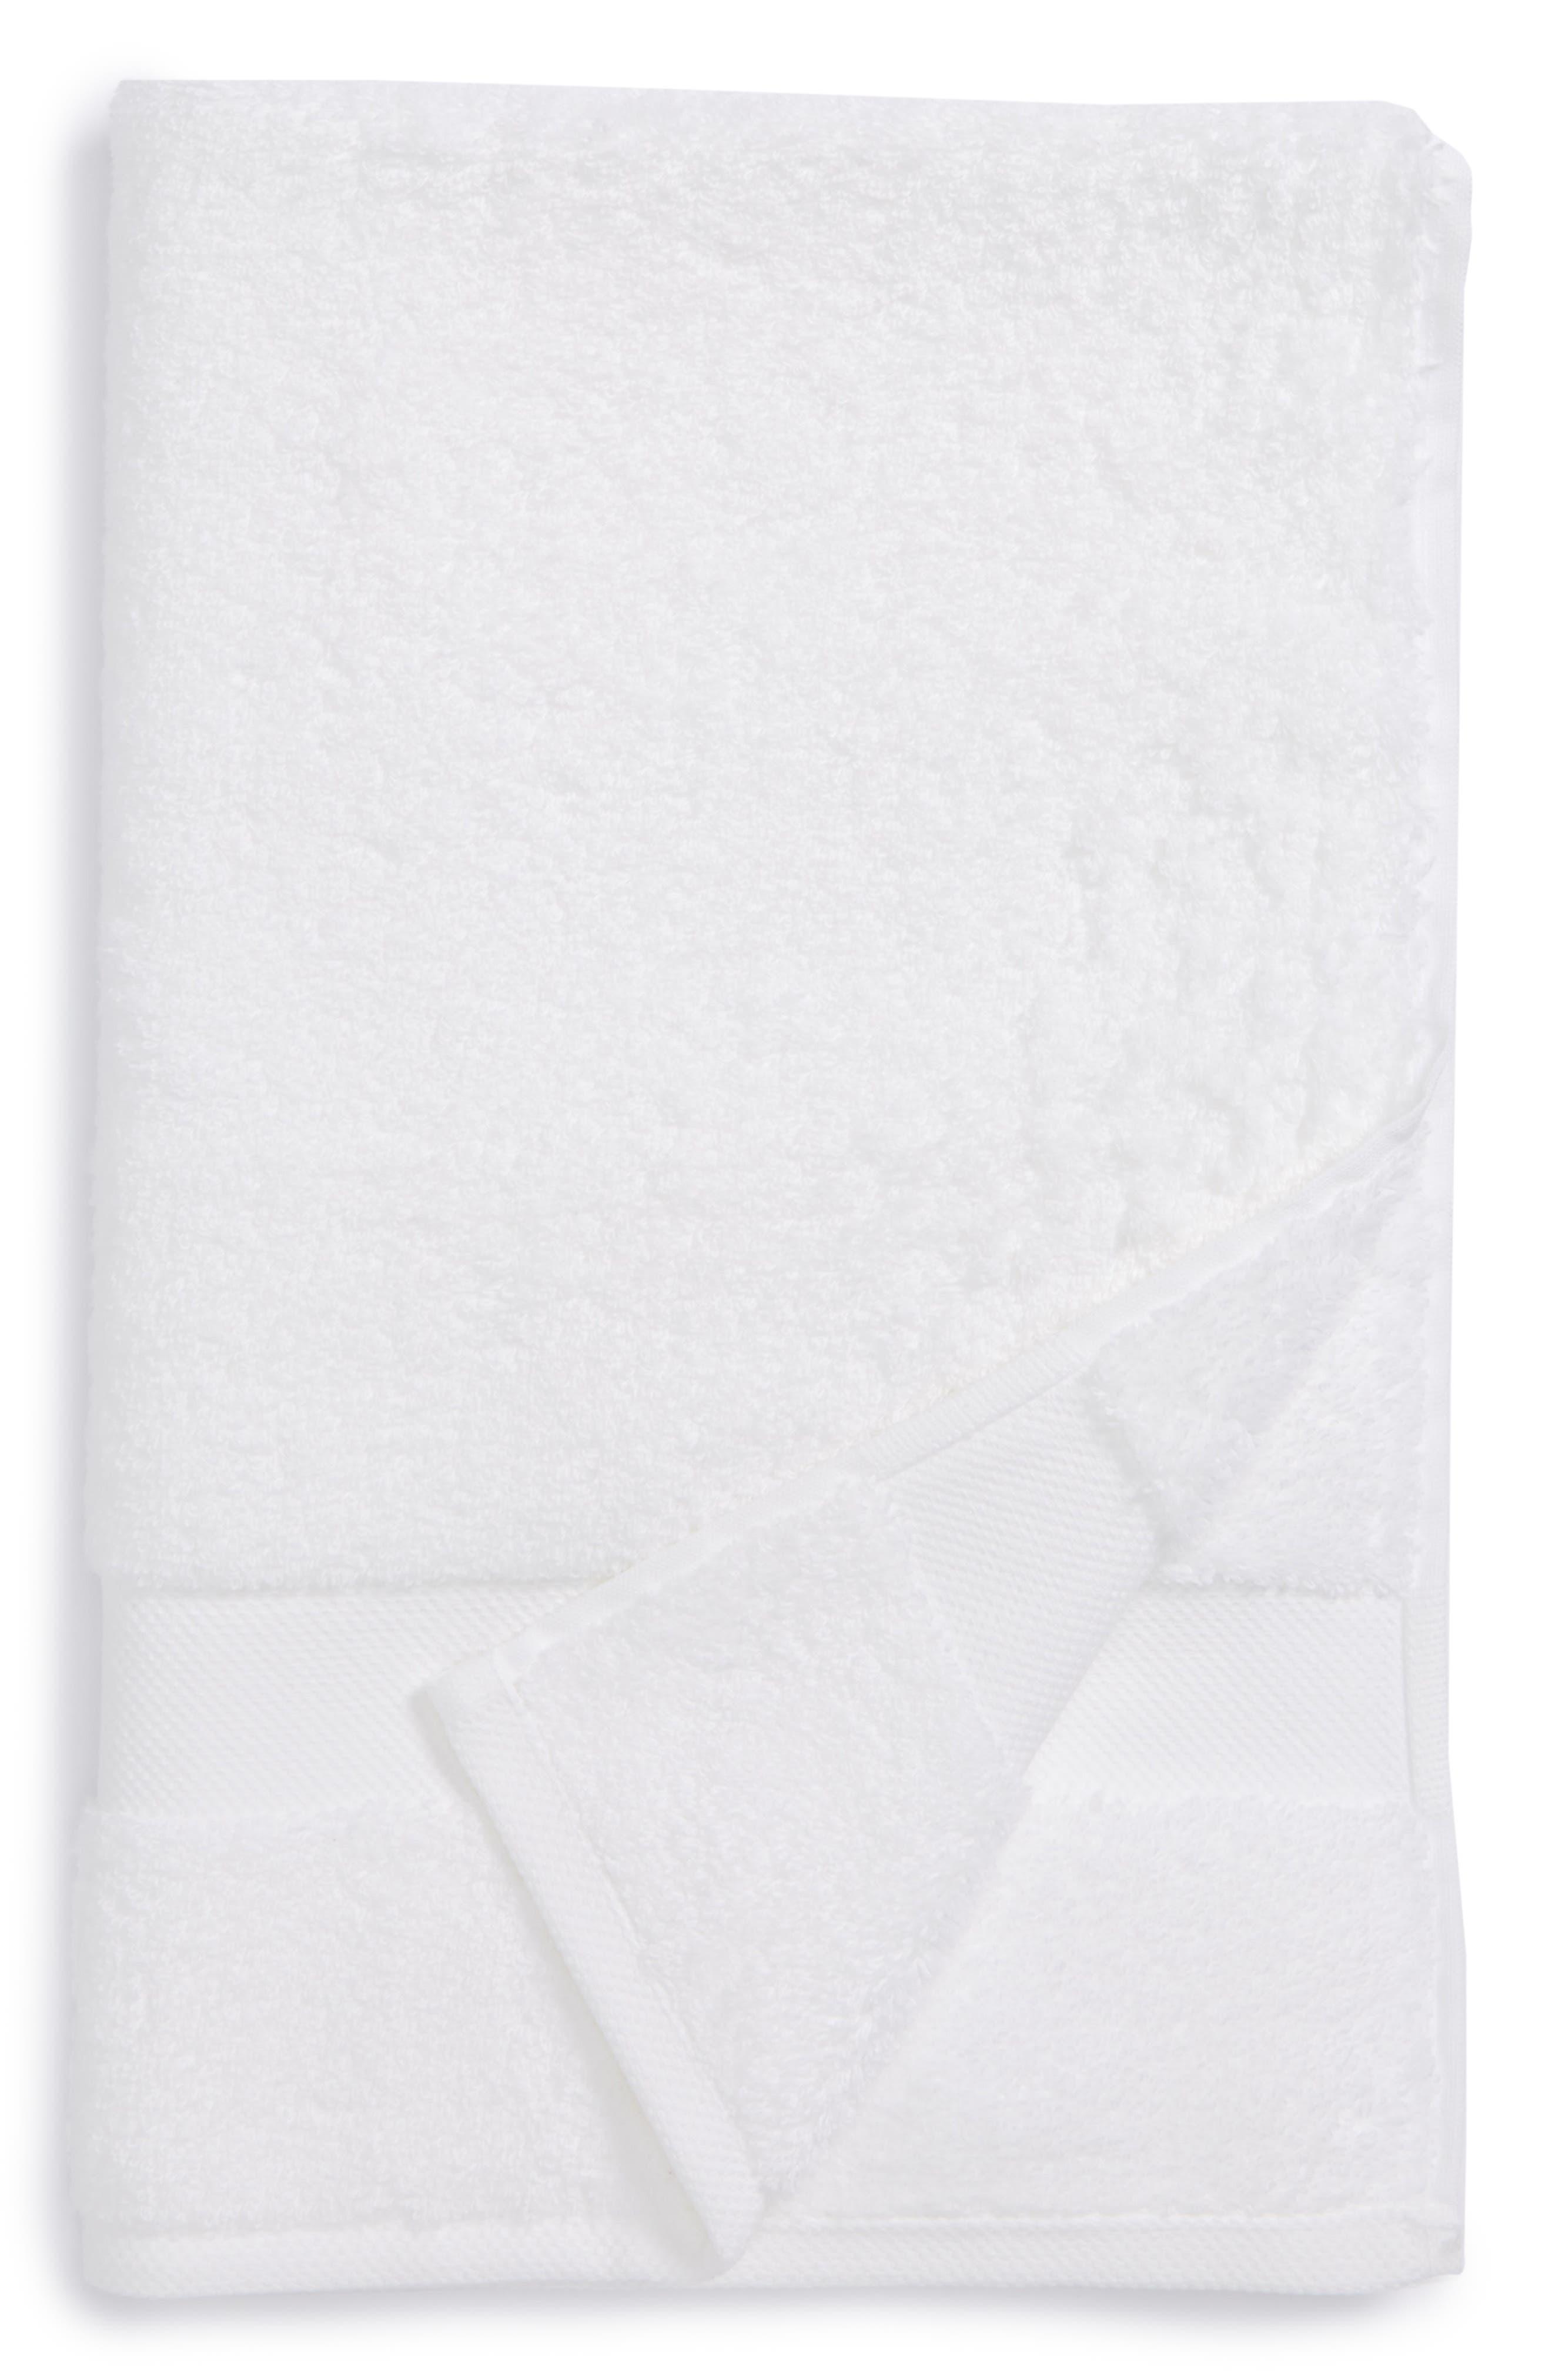 Lotus Hand Towel,                             Main thumbnail 1, color,                             WHITE